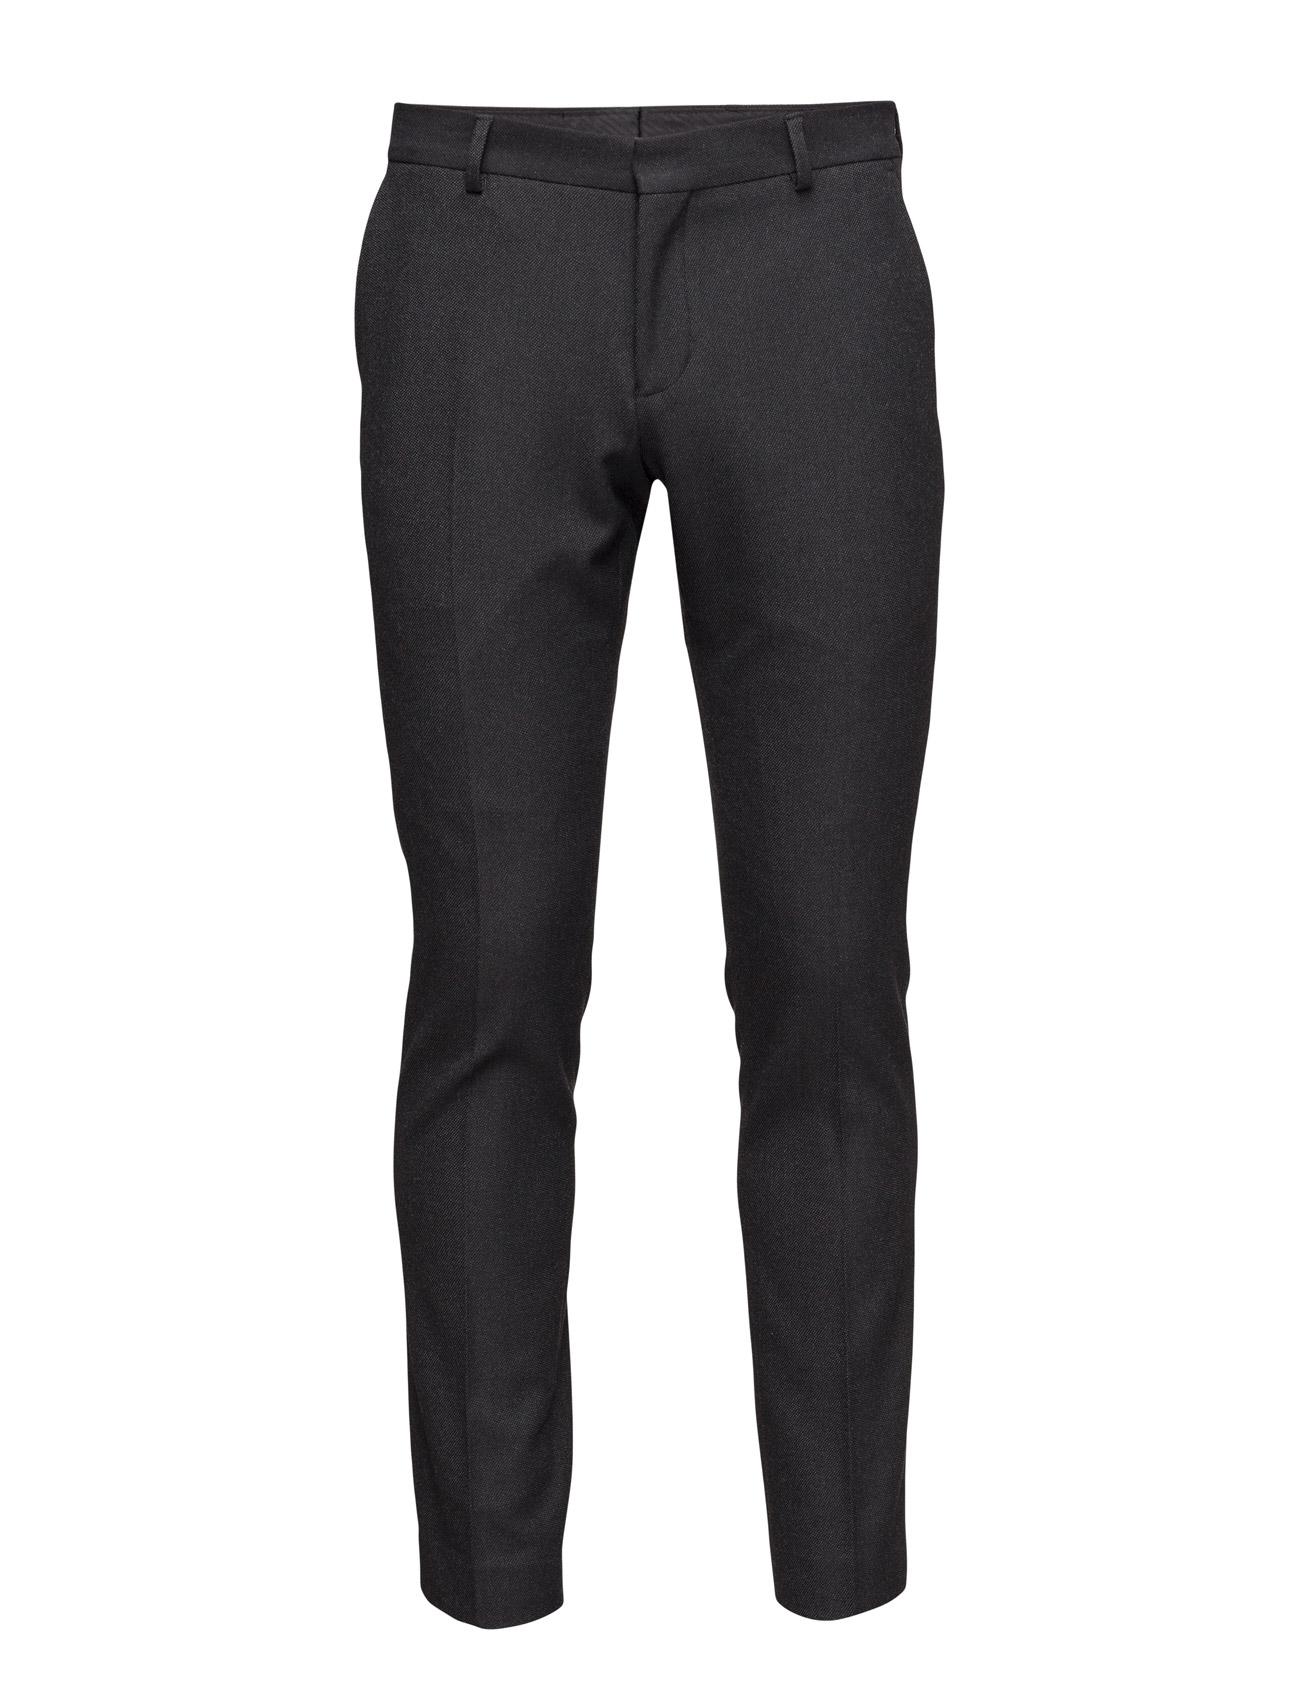 Shdone-Rory Kit Dark Grey Trouser Selected Homme Formelle til Mænd i Mørk grå